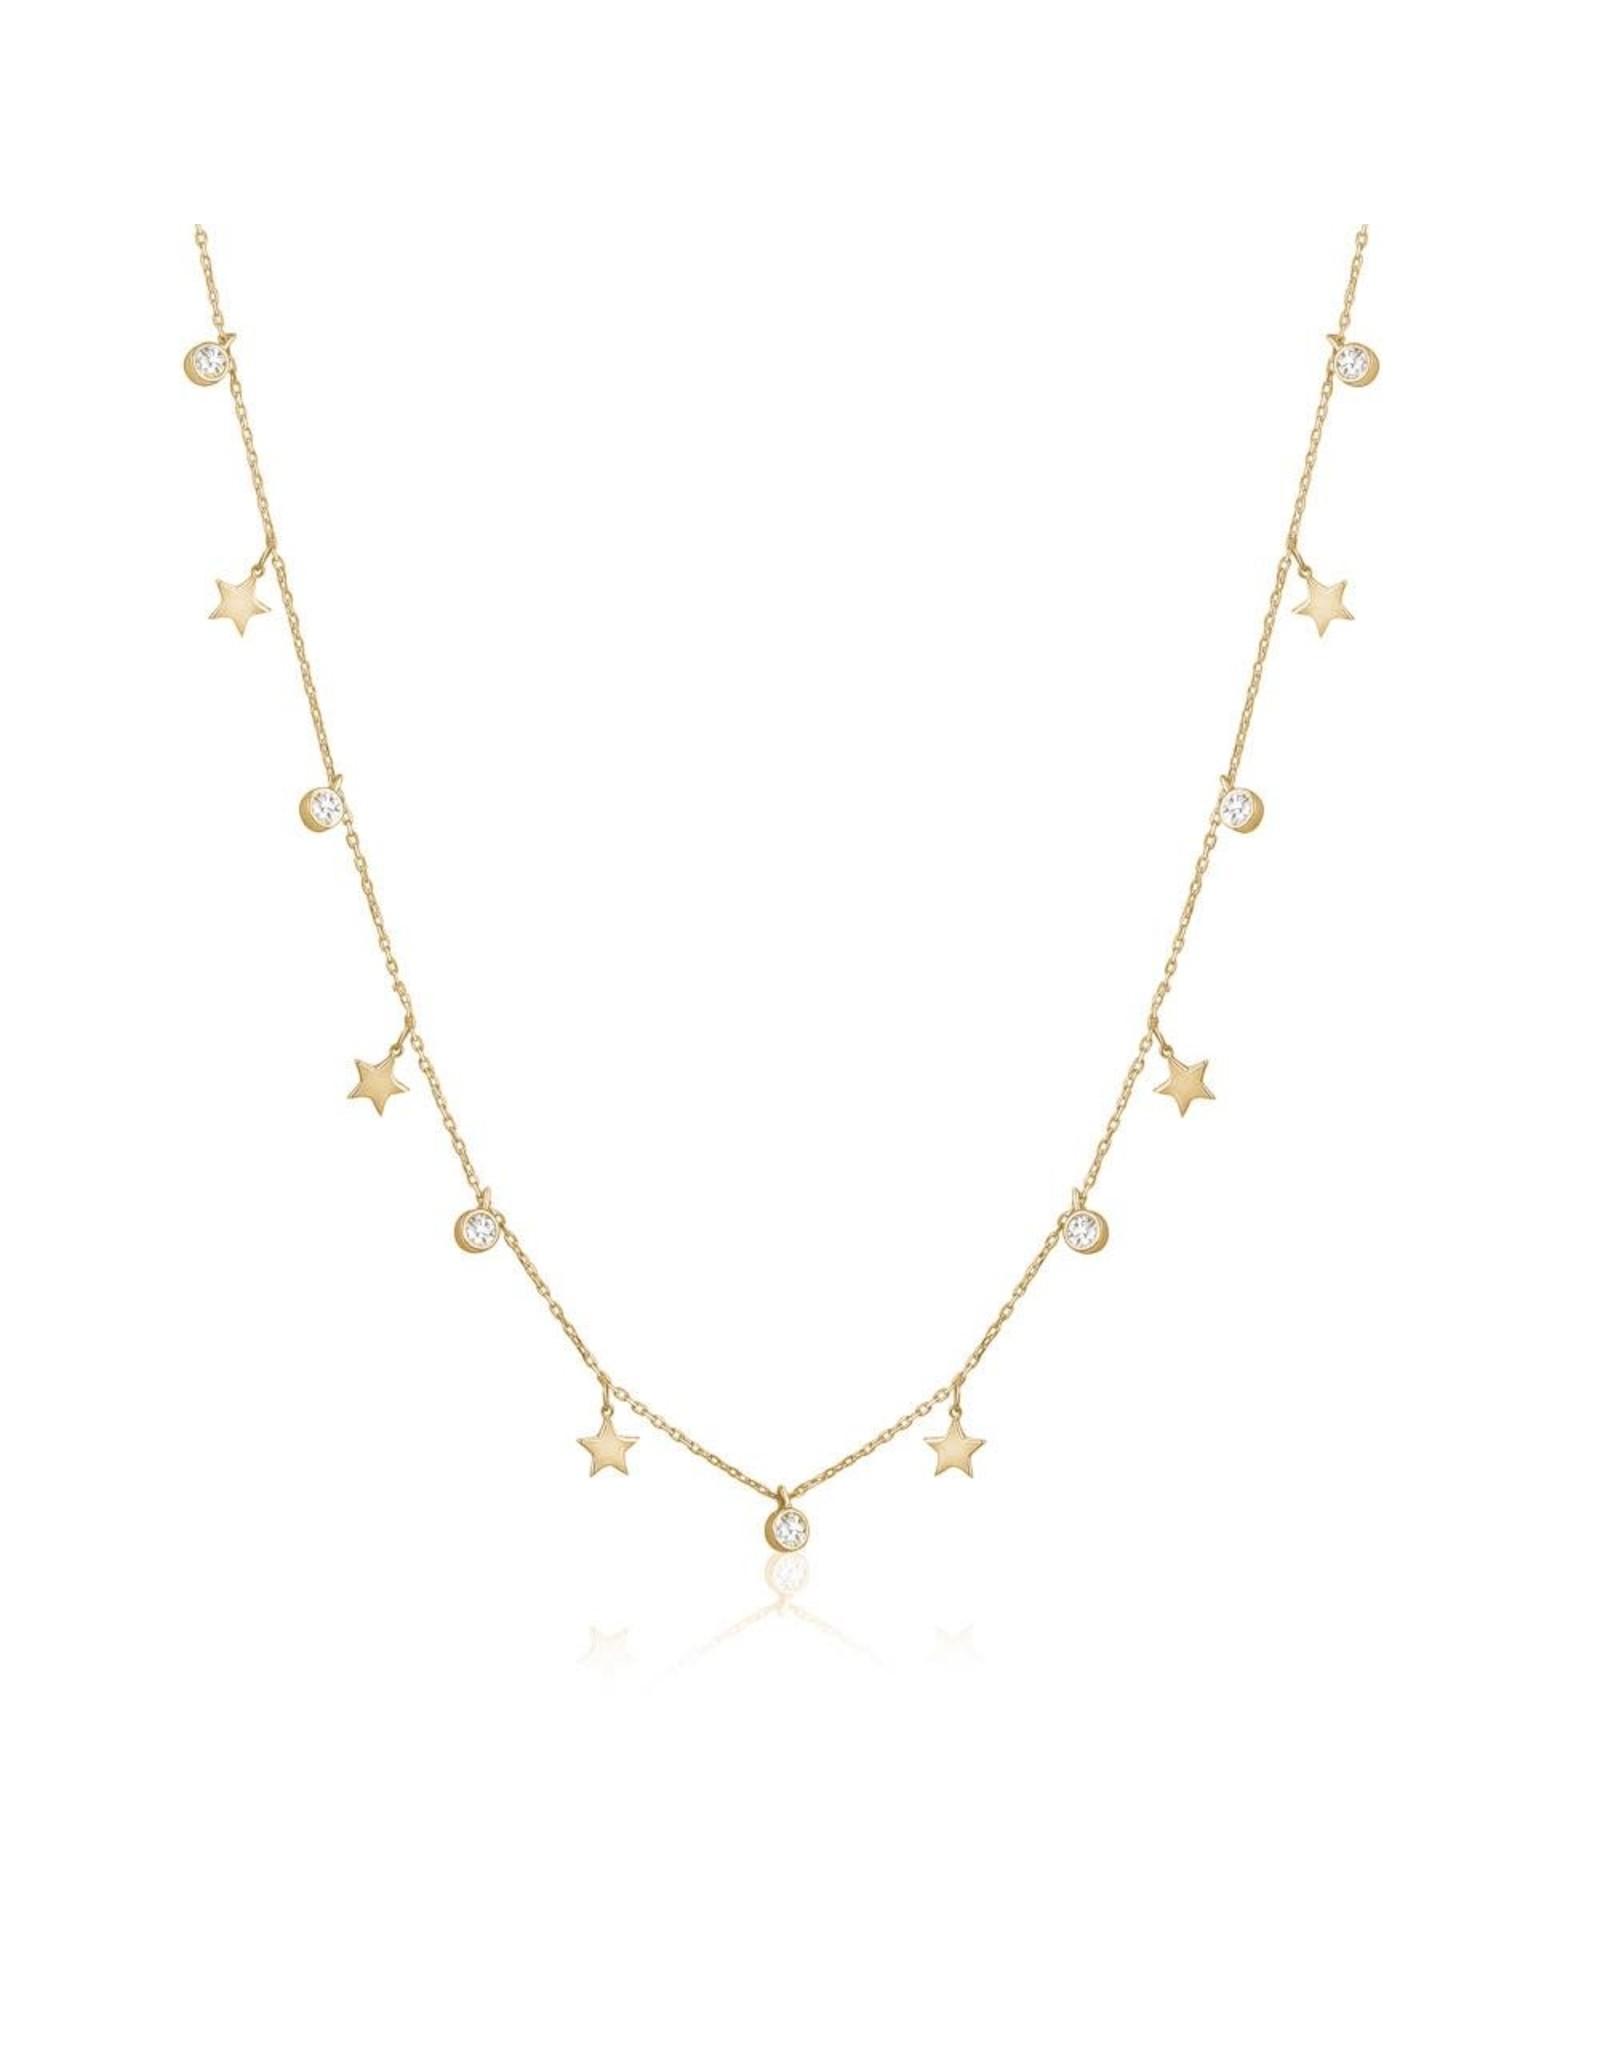 Limlim Dainty Stars + Crystal Necklace